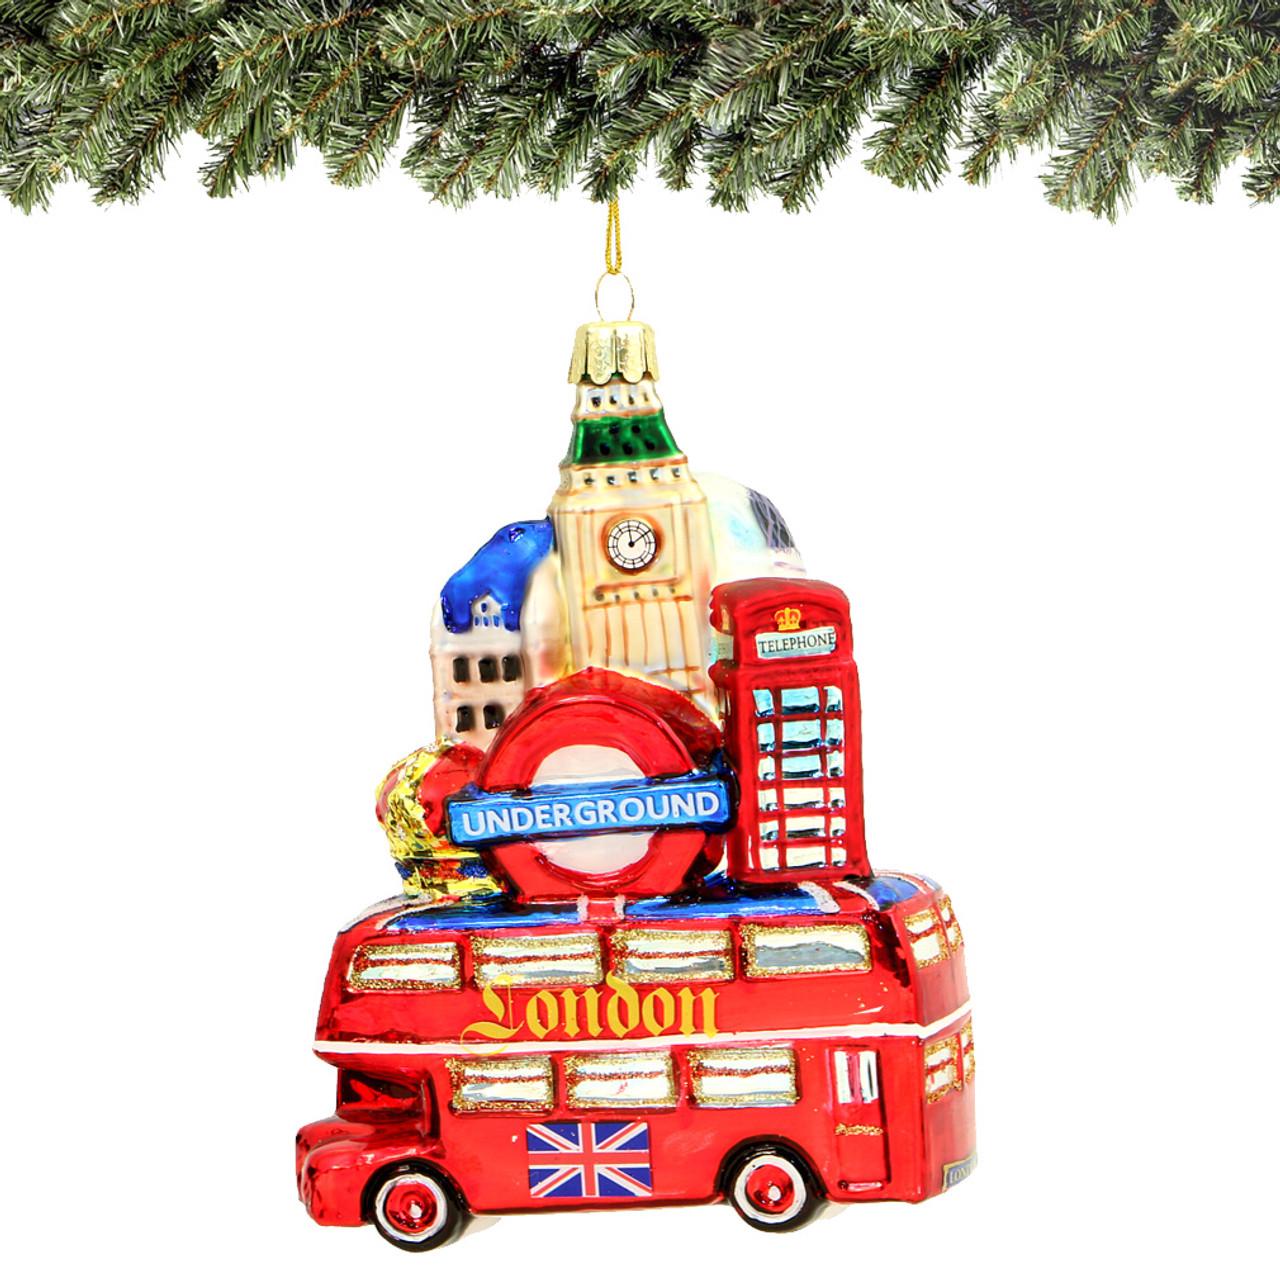 5b436737af0d London Bus and Landmarks Glass Ornament